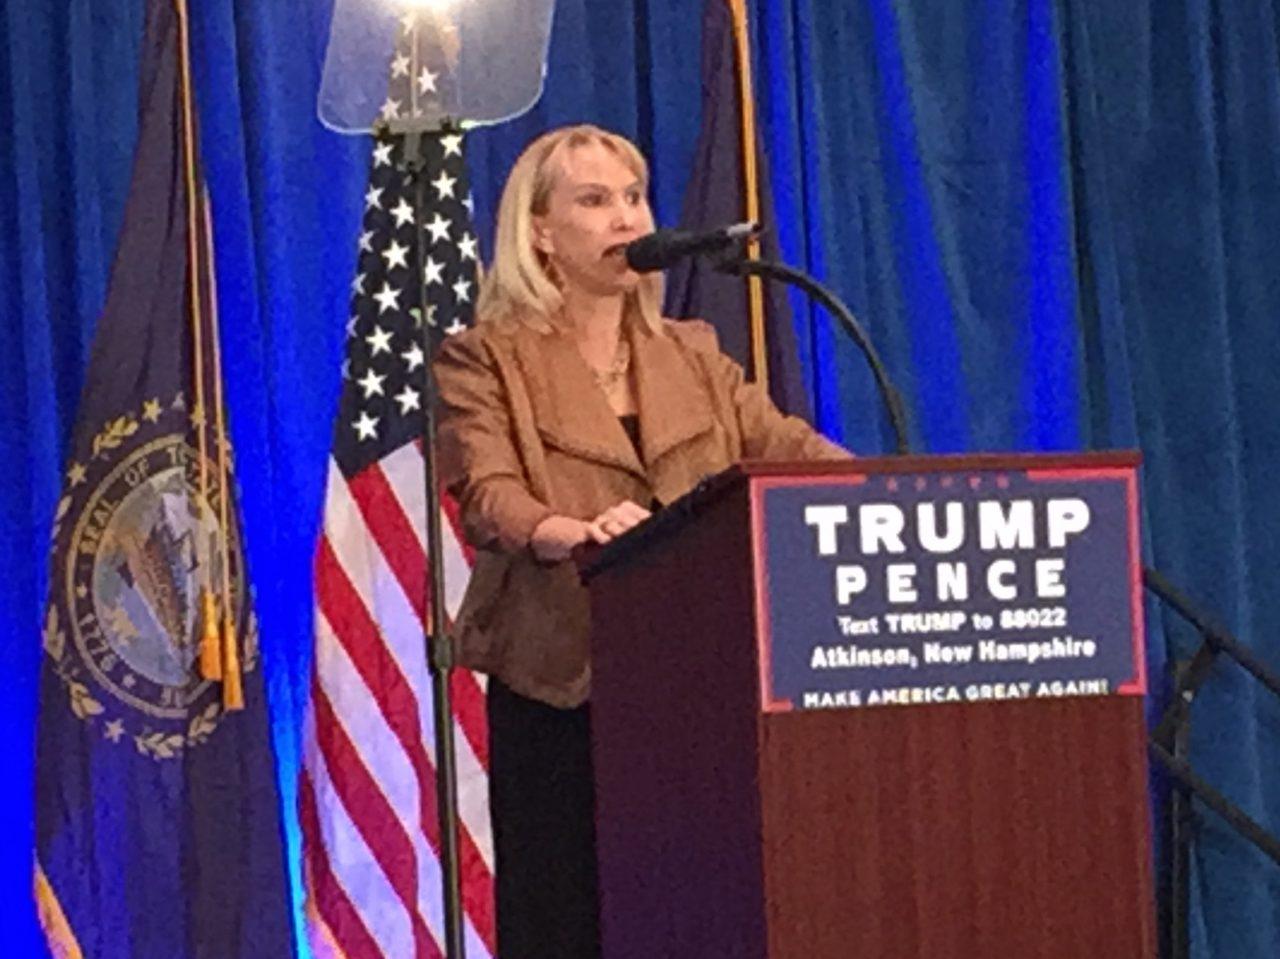 Glenn Doherty sister New Hampshire rally (Joel Pollak : Breitbart News)